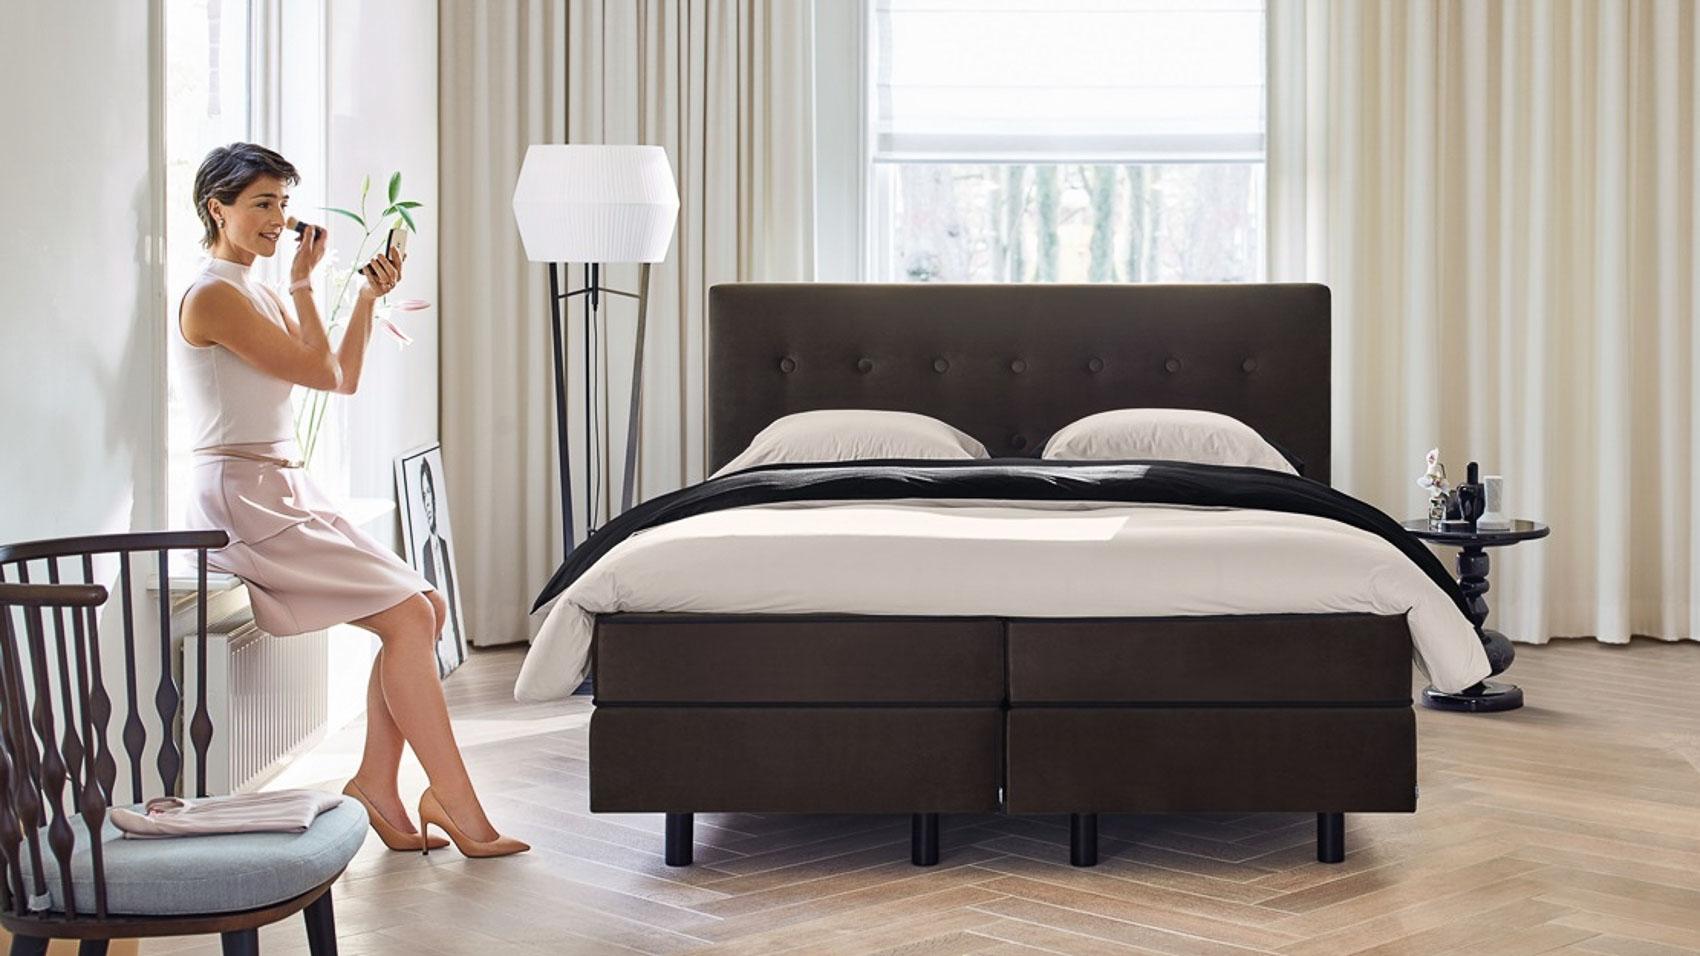 original boxspringbett auping portofino schlafzimmer und bettenhaus k rner co gmbh in n rnberg. Black Bedroom Furniture Sets. Home Design Ideas